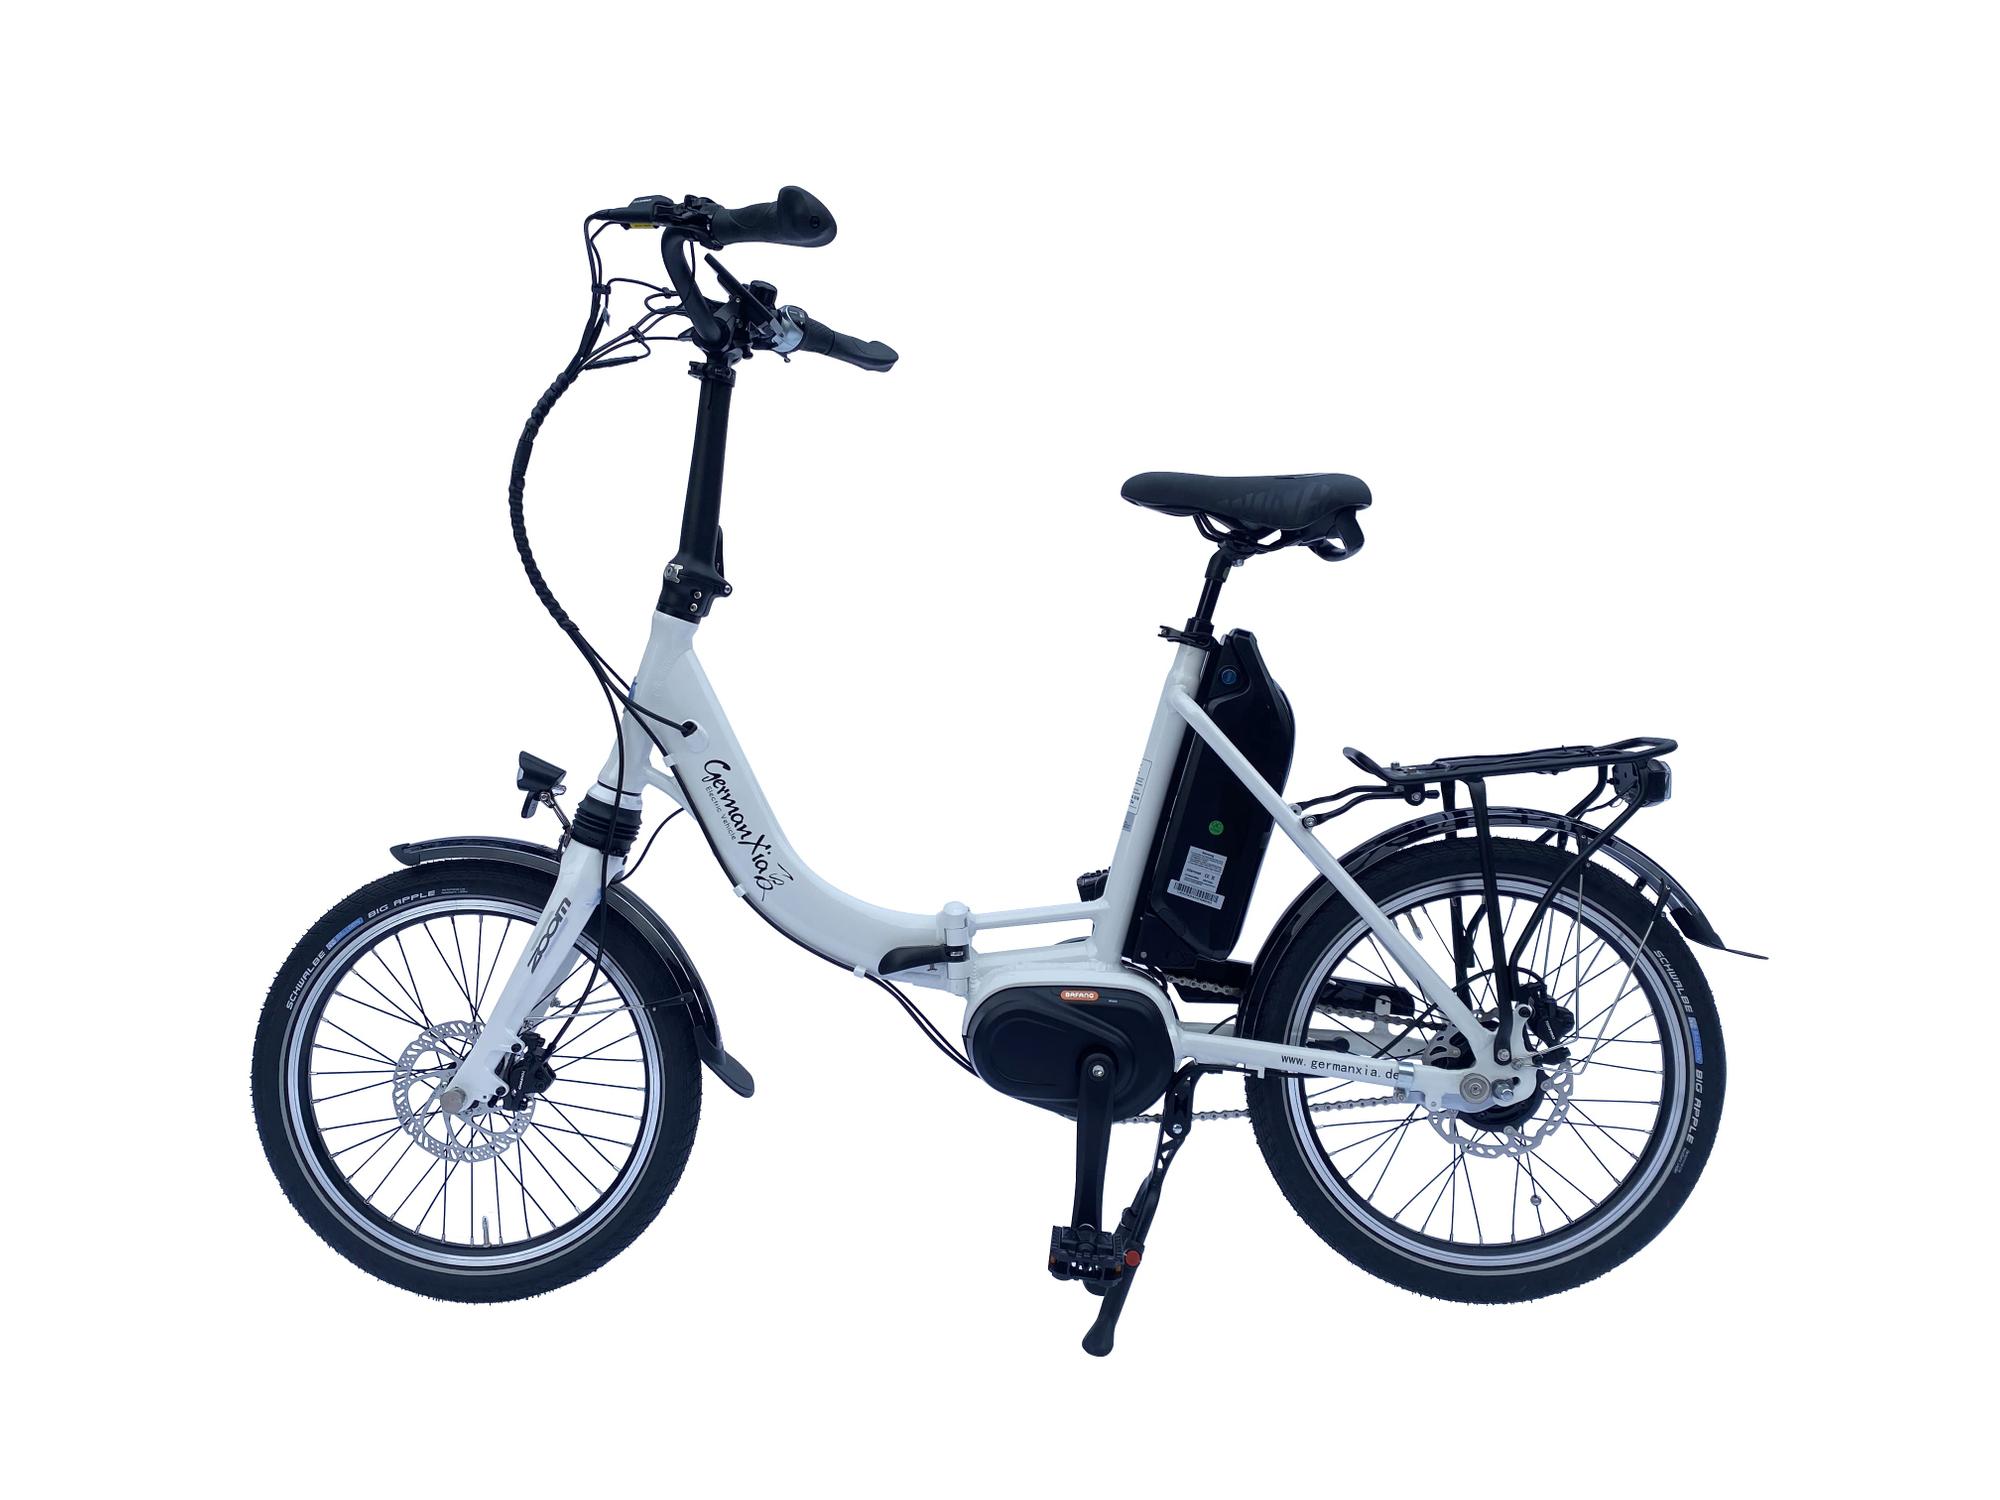 E-Bike Klapprad Mobilemaster Offroad CM 8G Bafang Mittelmotor max. 80 Nm. mit Kettenantrieb